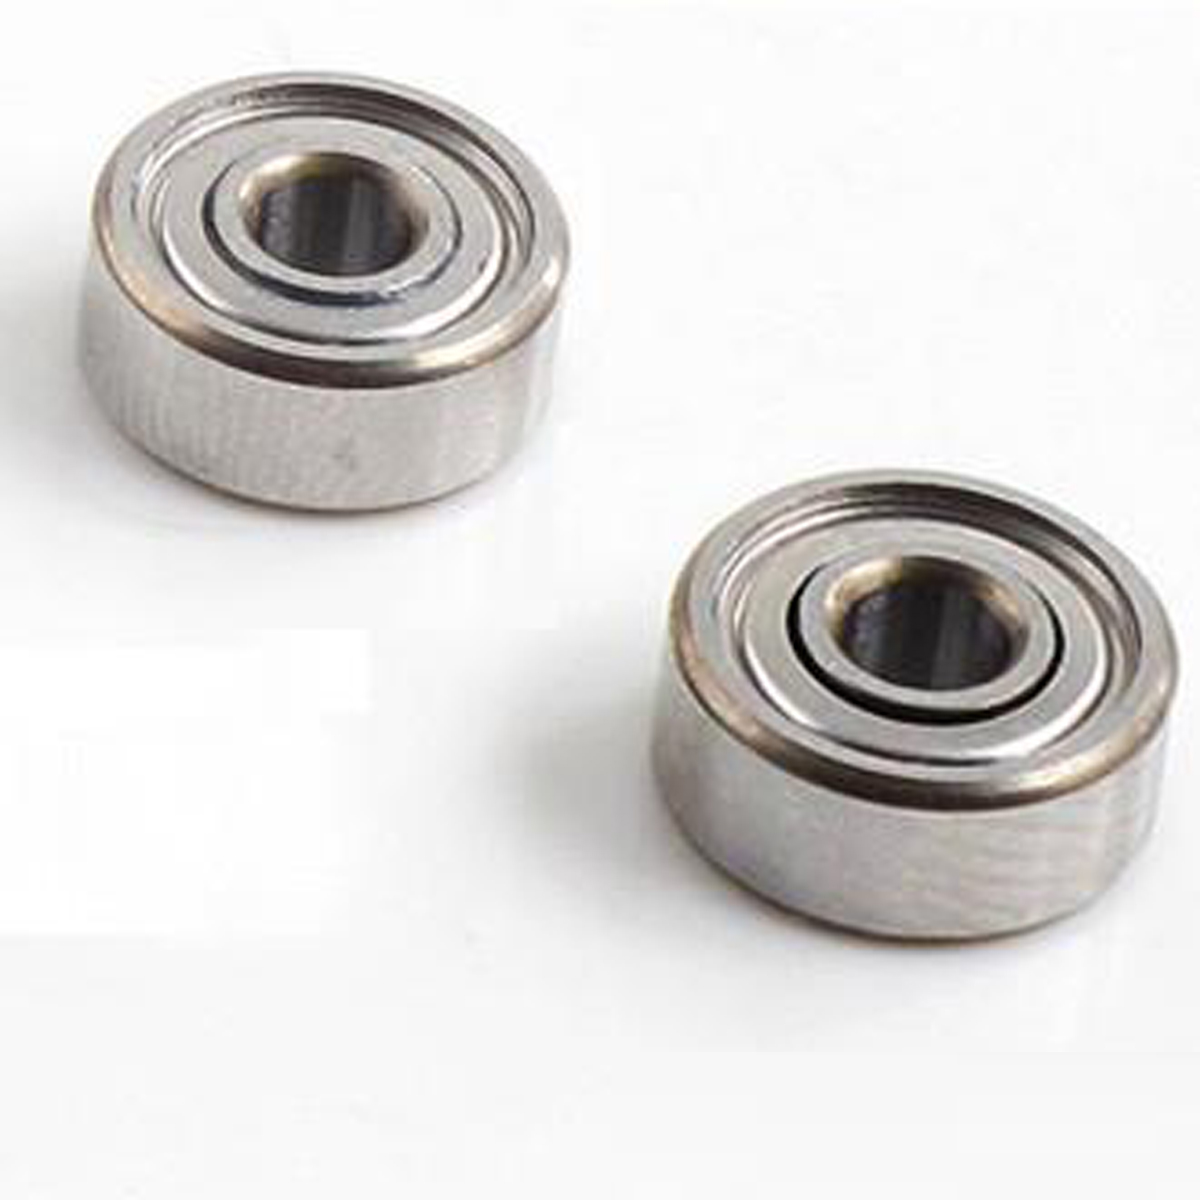 Hobbywing Ball Bearing For Xerun 3656 4068 4274 Ezrun